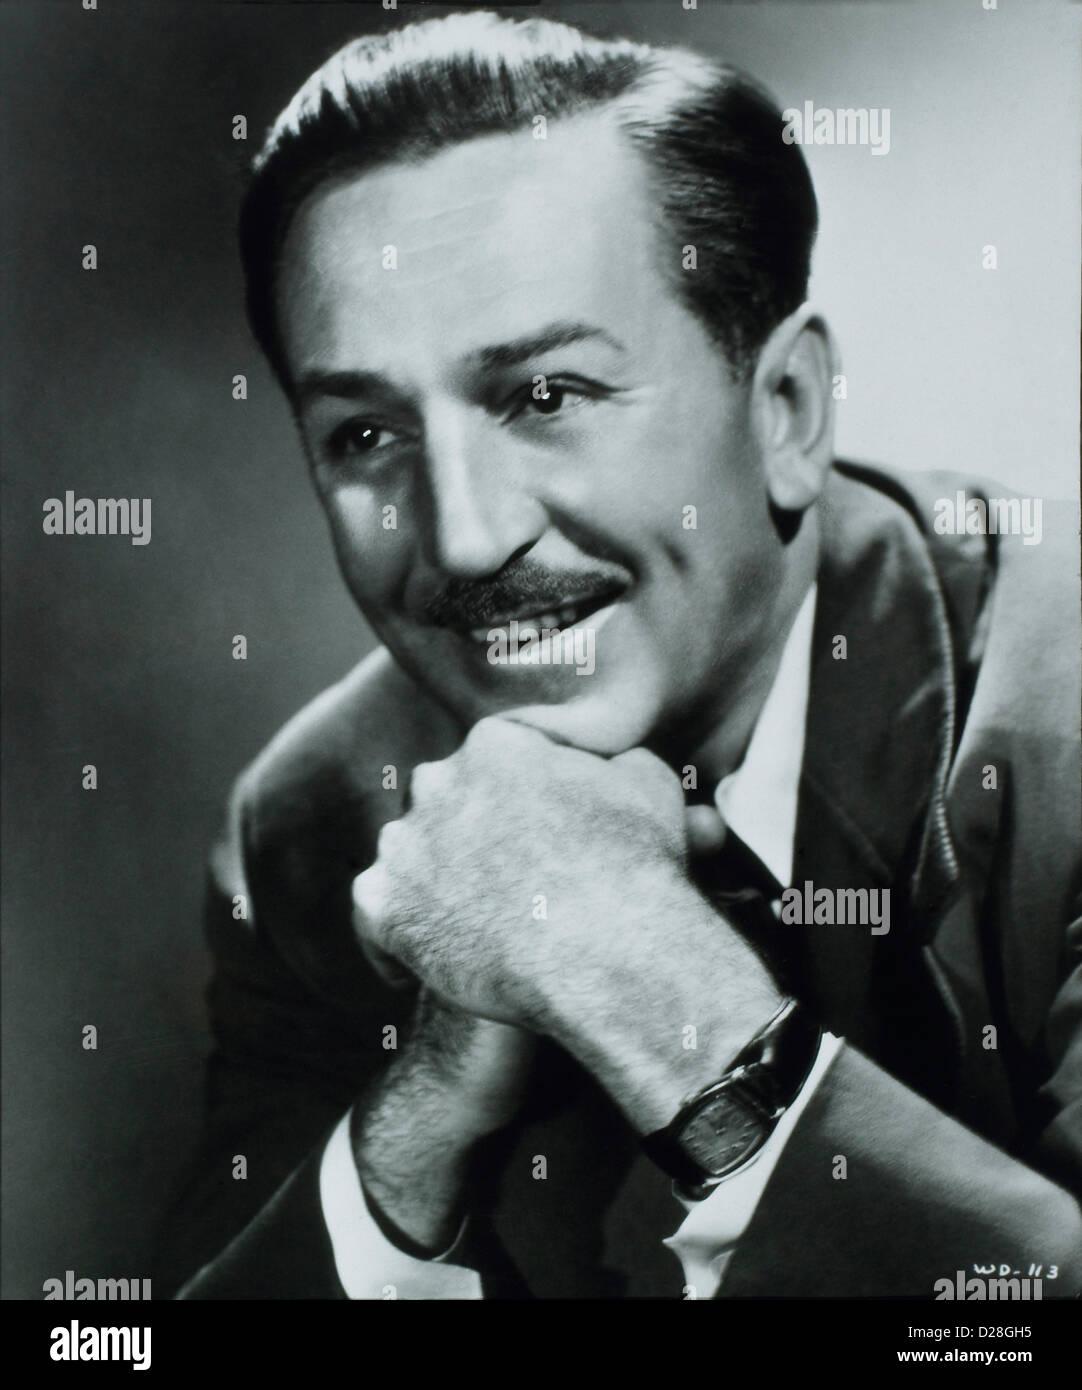 Walt Disney (1901-1966) Portrait, Circa 1940's - Stock Image